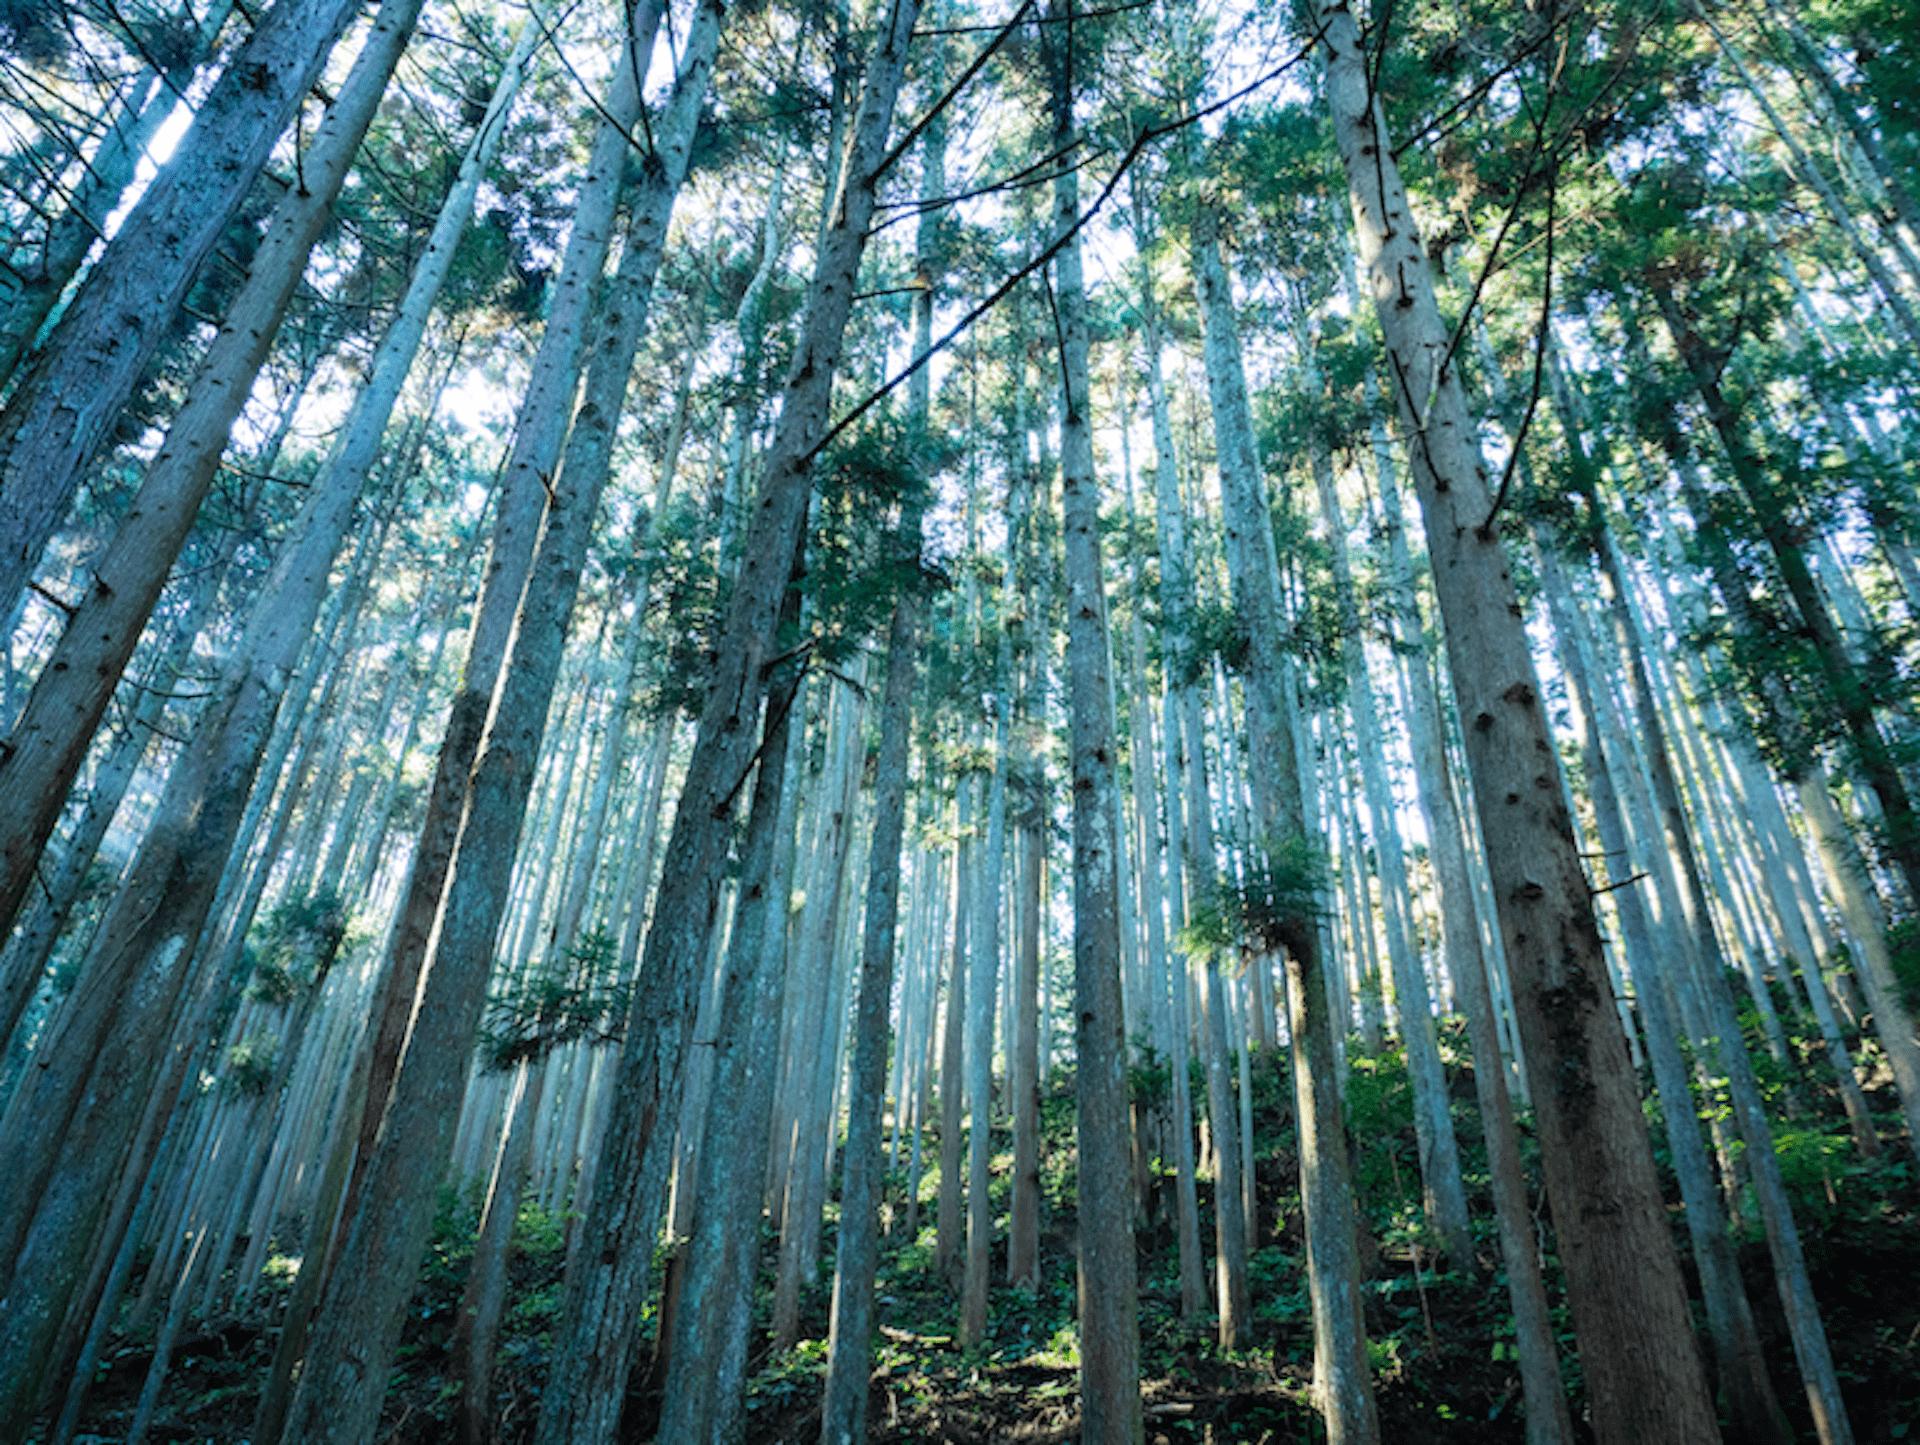 sub7-1920x1445 開催間近!奈良の自然に包まれた芸術祭、ライゾマ齋藤精一がプロデュースする<MIND TRAIL 奥大和 心のなかの美術館>